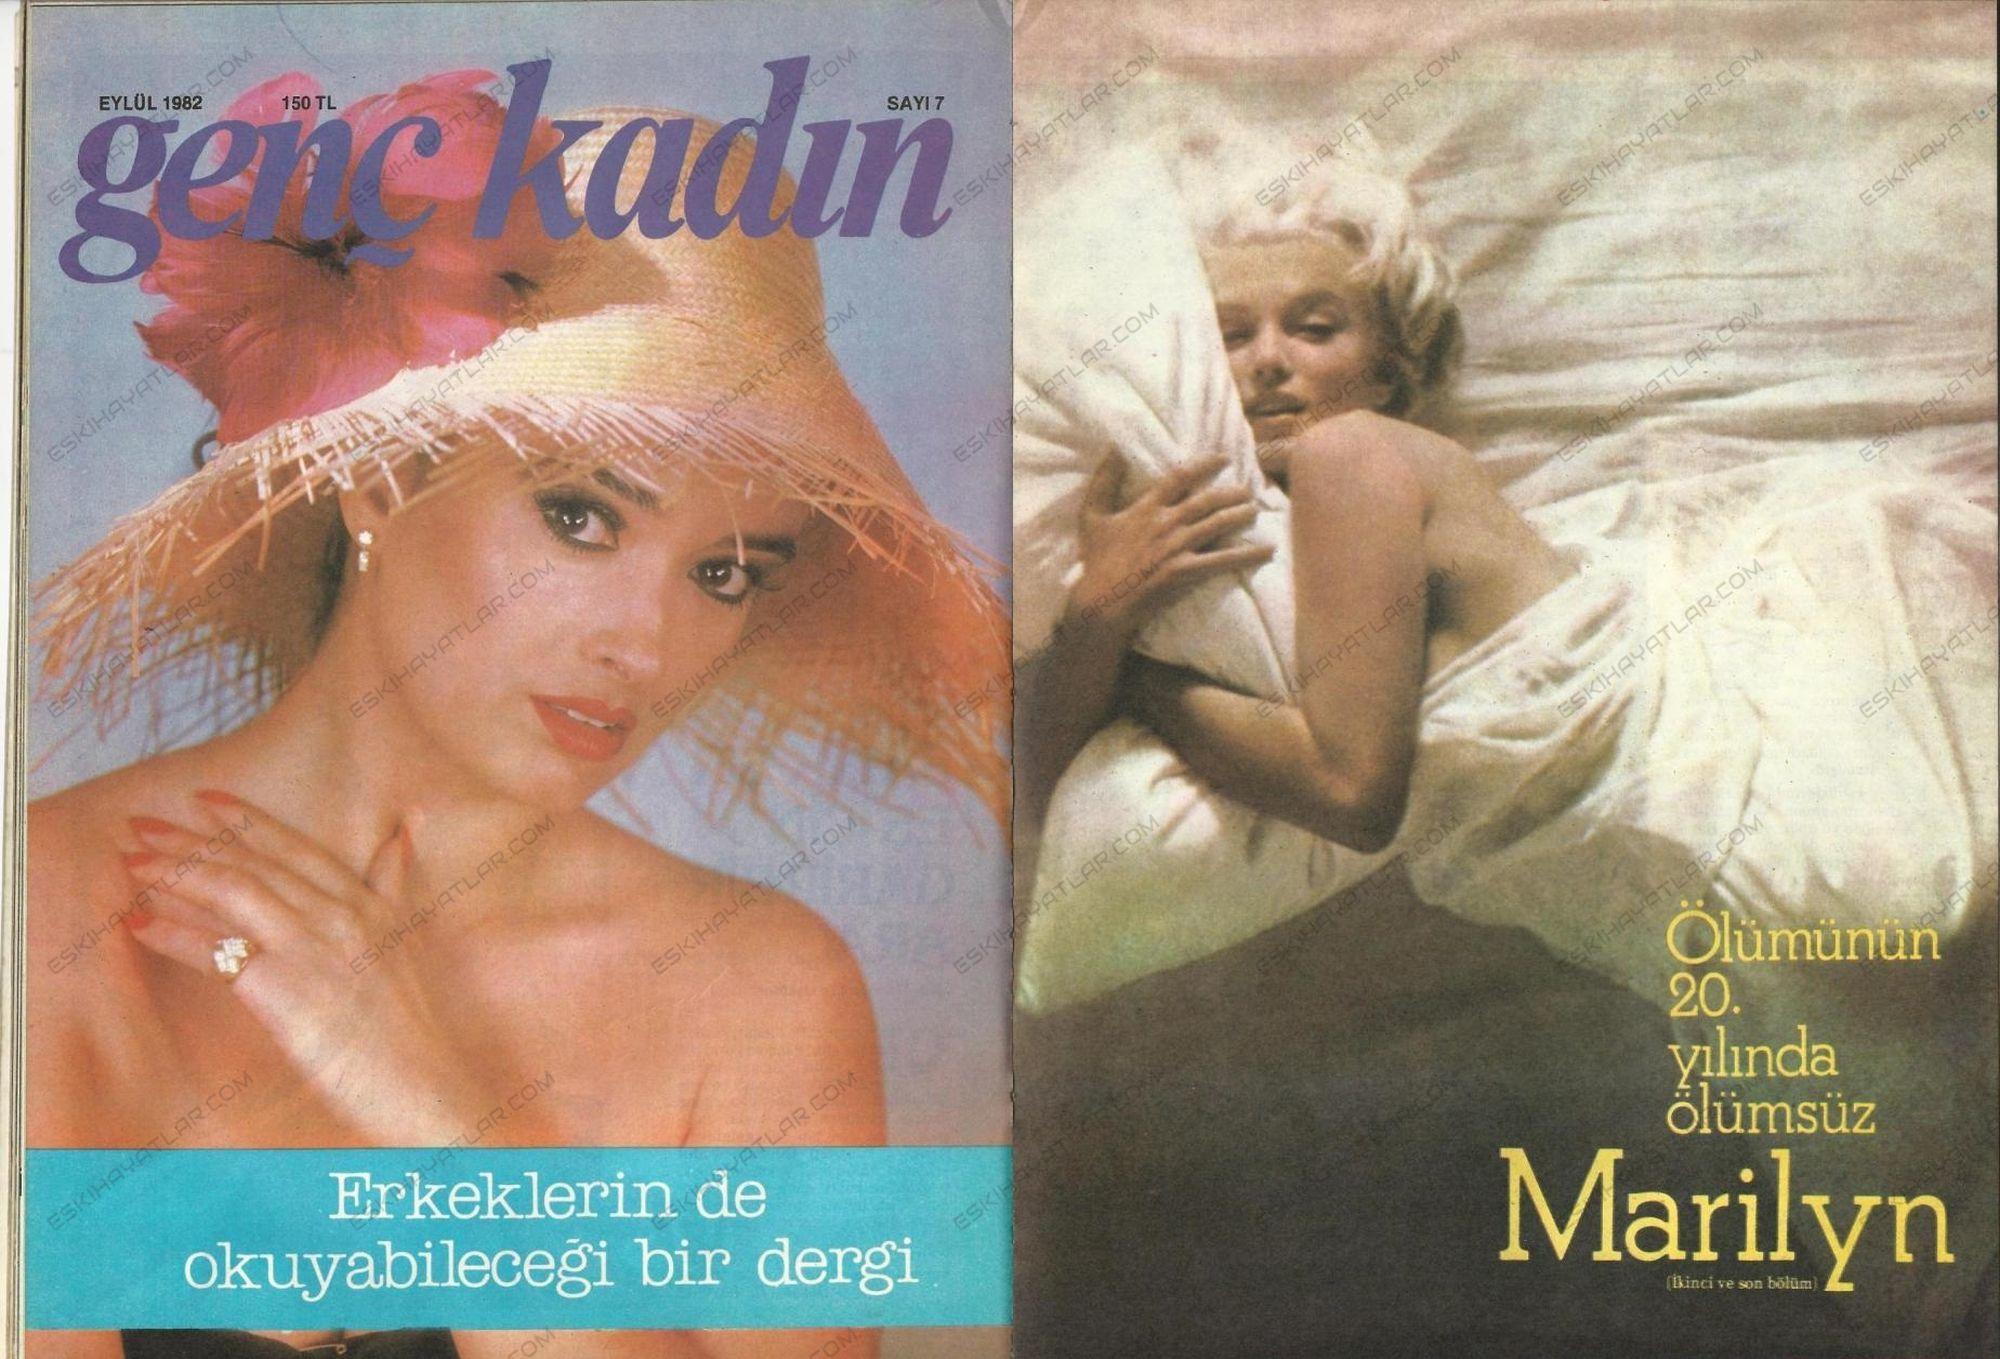 marilyn-monroe-fotograflari-erkekce-dergisi-arsivleri (9)